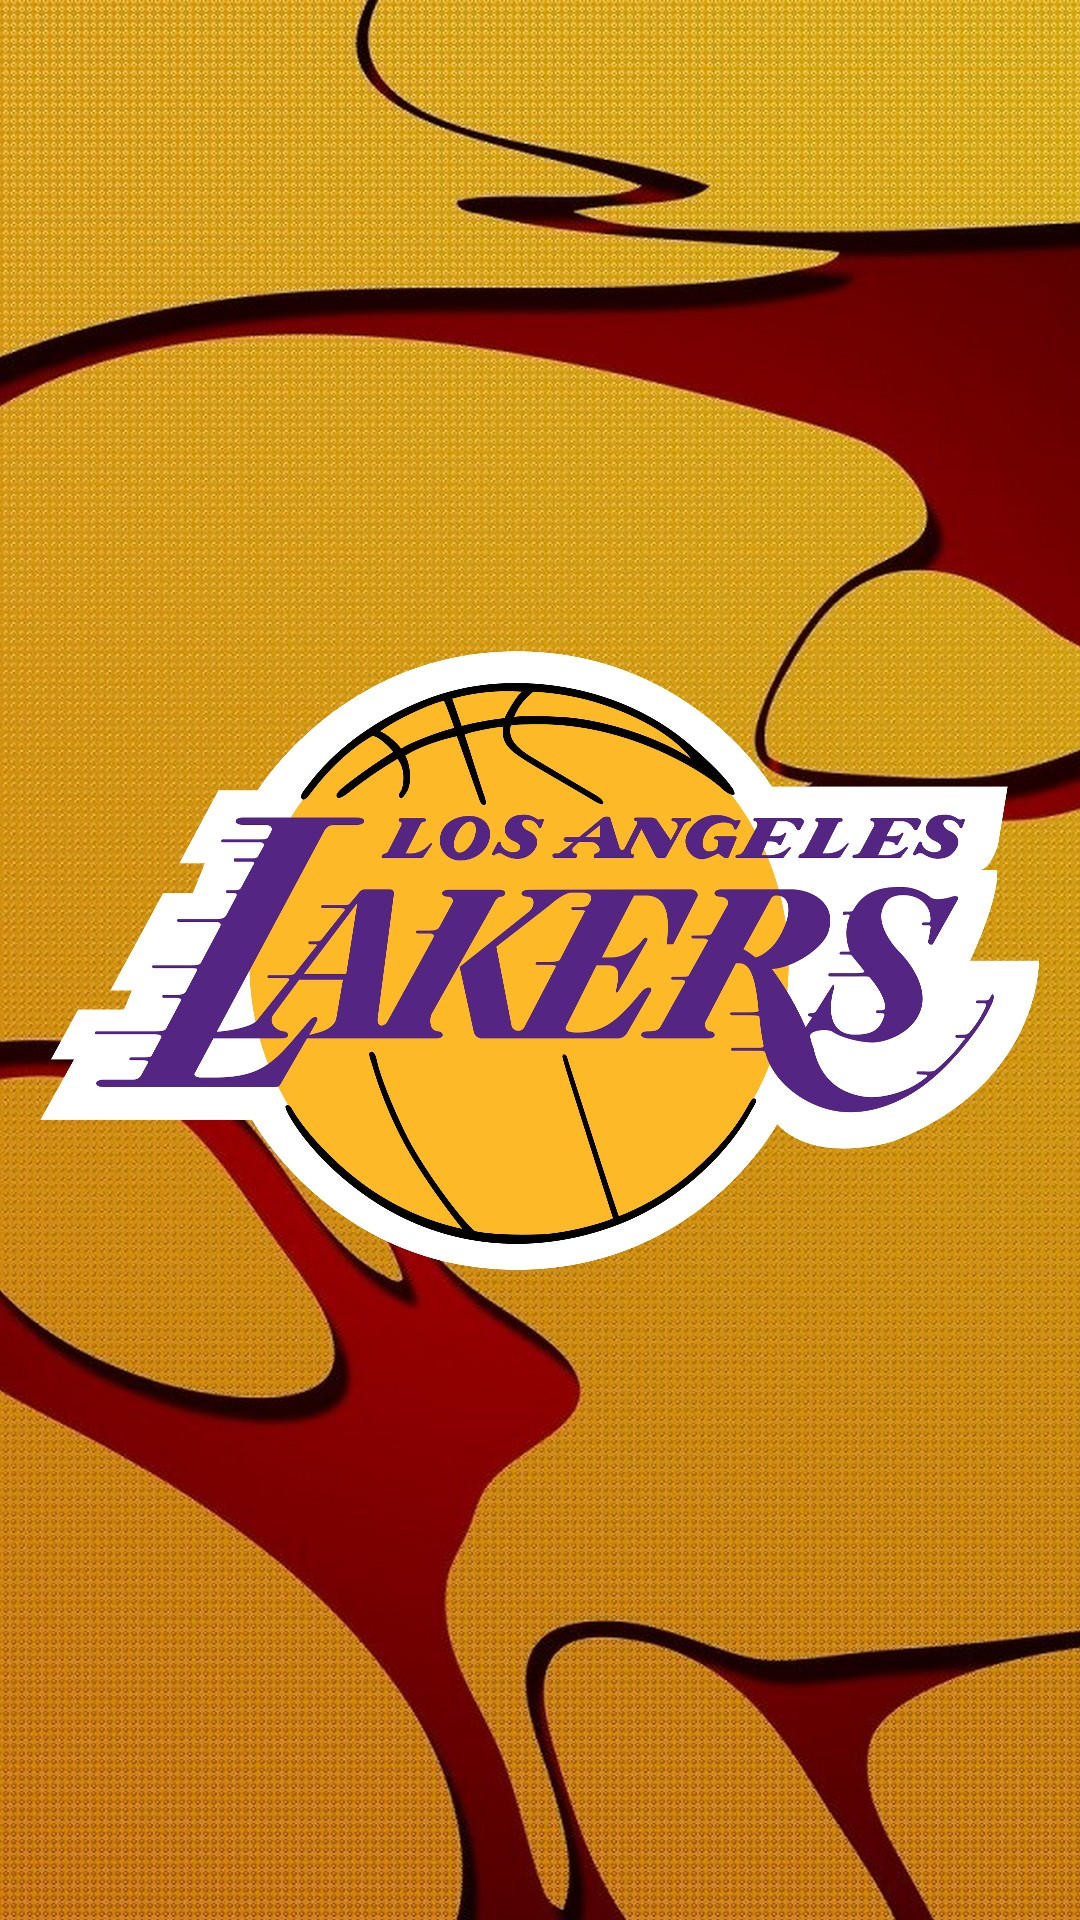 LA Lakers iPhone 6s Plus Wallpaper   2020 NBA iPhone Wallpaper 1080x1920